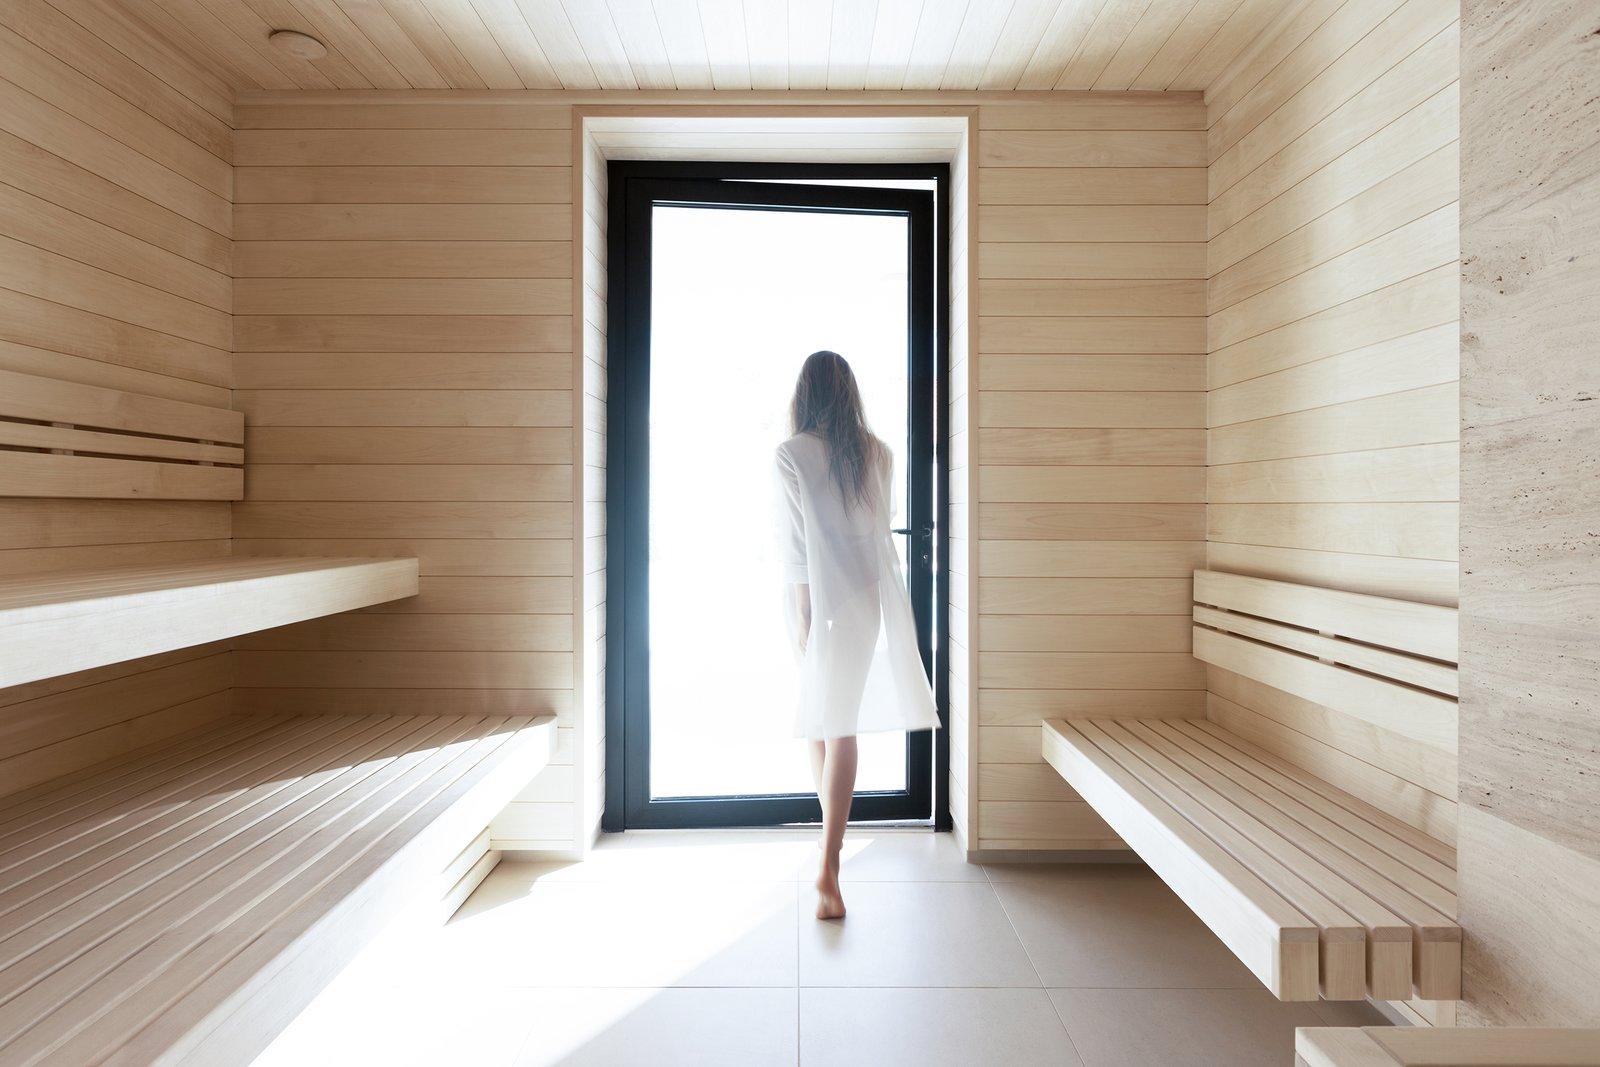 Bath, Wood, Light Hardwood, Porcelain Tile, and Wall WH Residence | M3 Architects  Best Bath Porcelain Tile Light Hardwood Photos from WH Residence